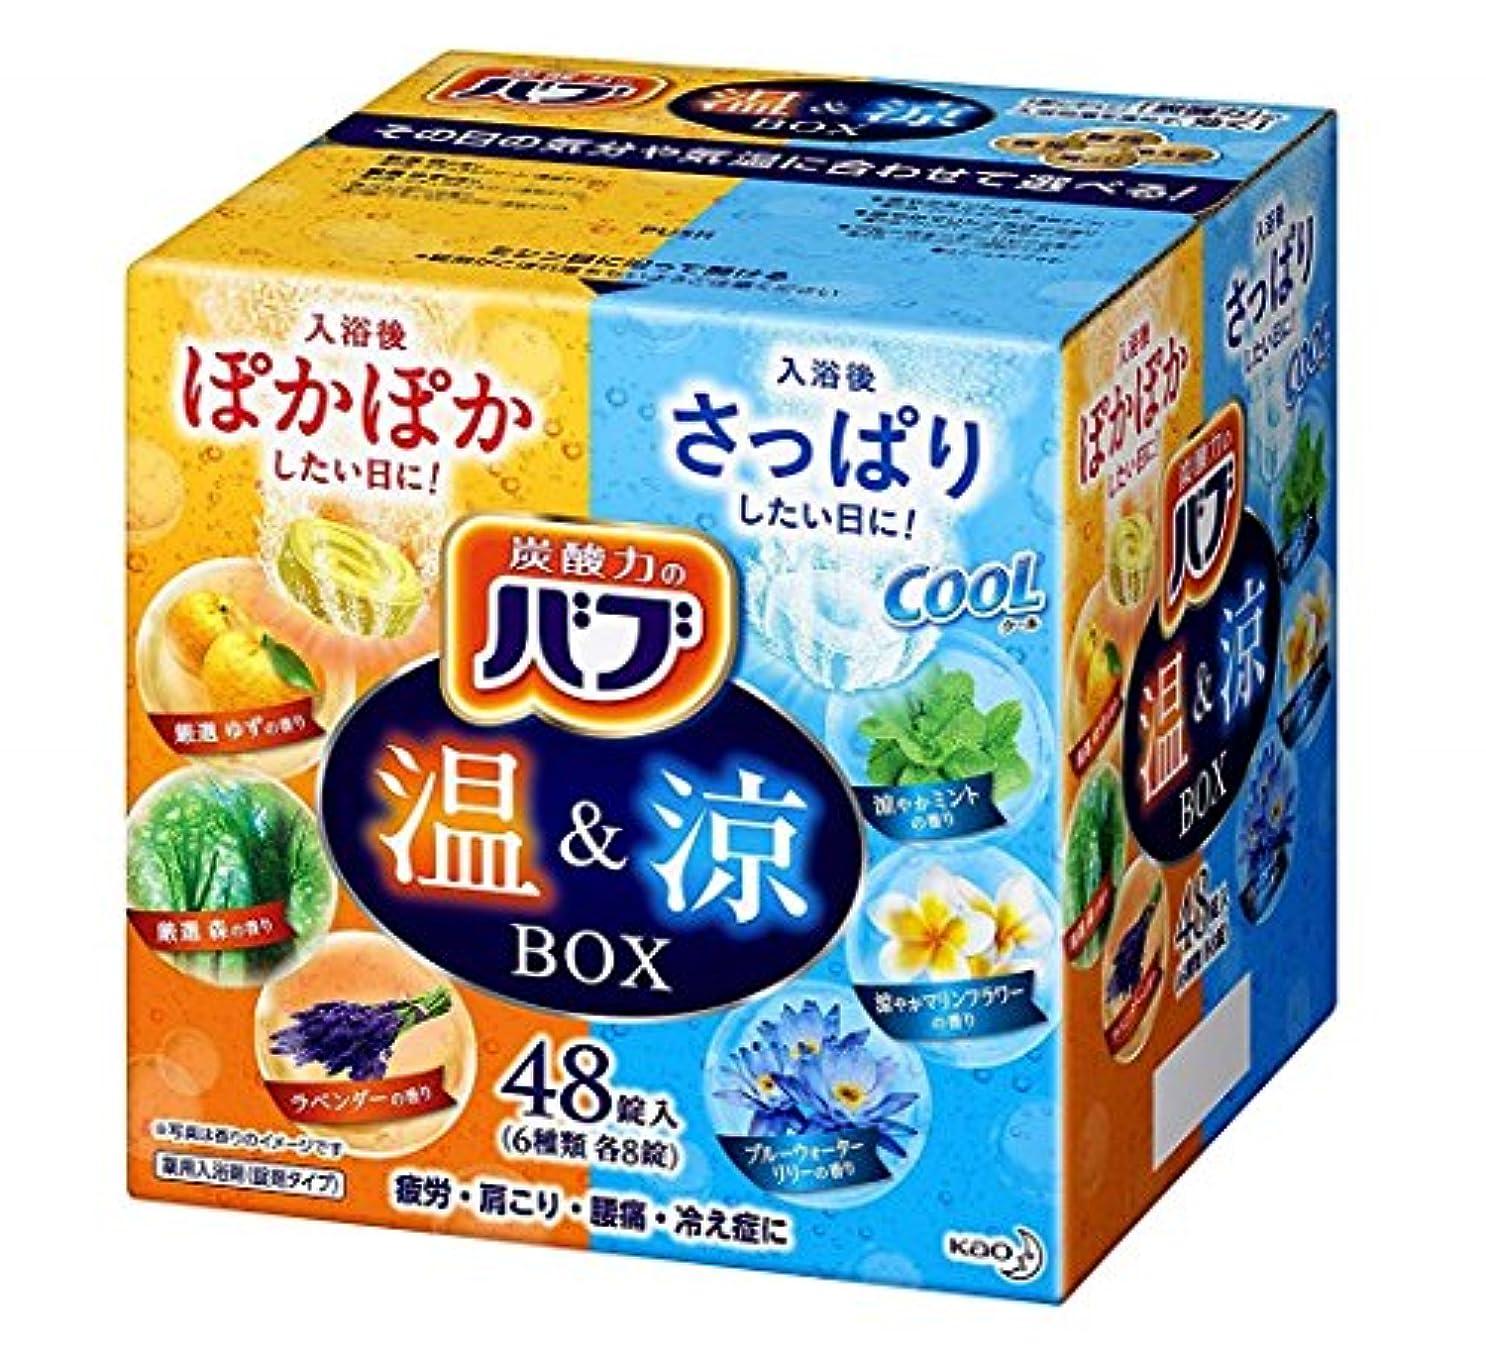 無一文憤る本質的に【大容量】バブ 温&涼BOX 48錠 炭酸入浴剤